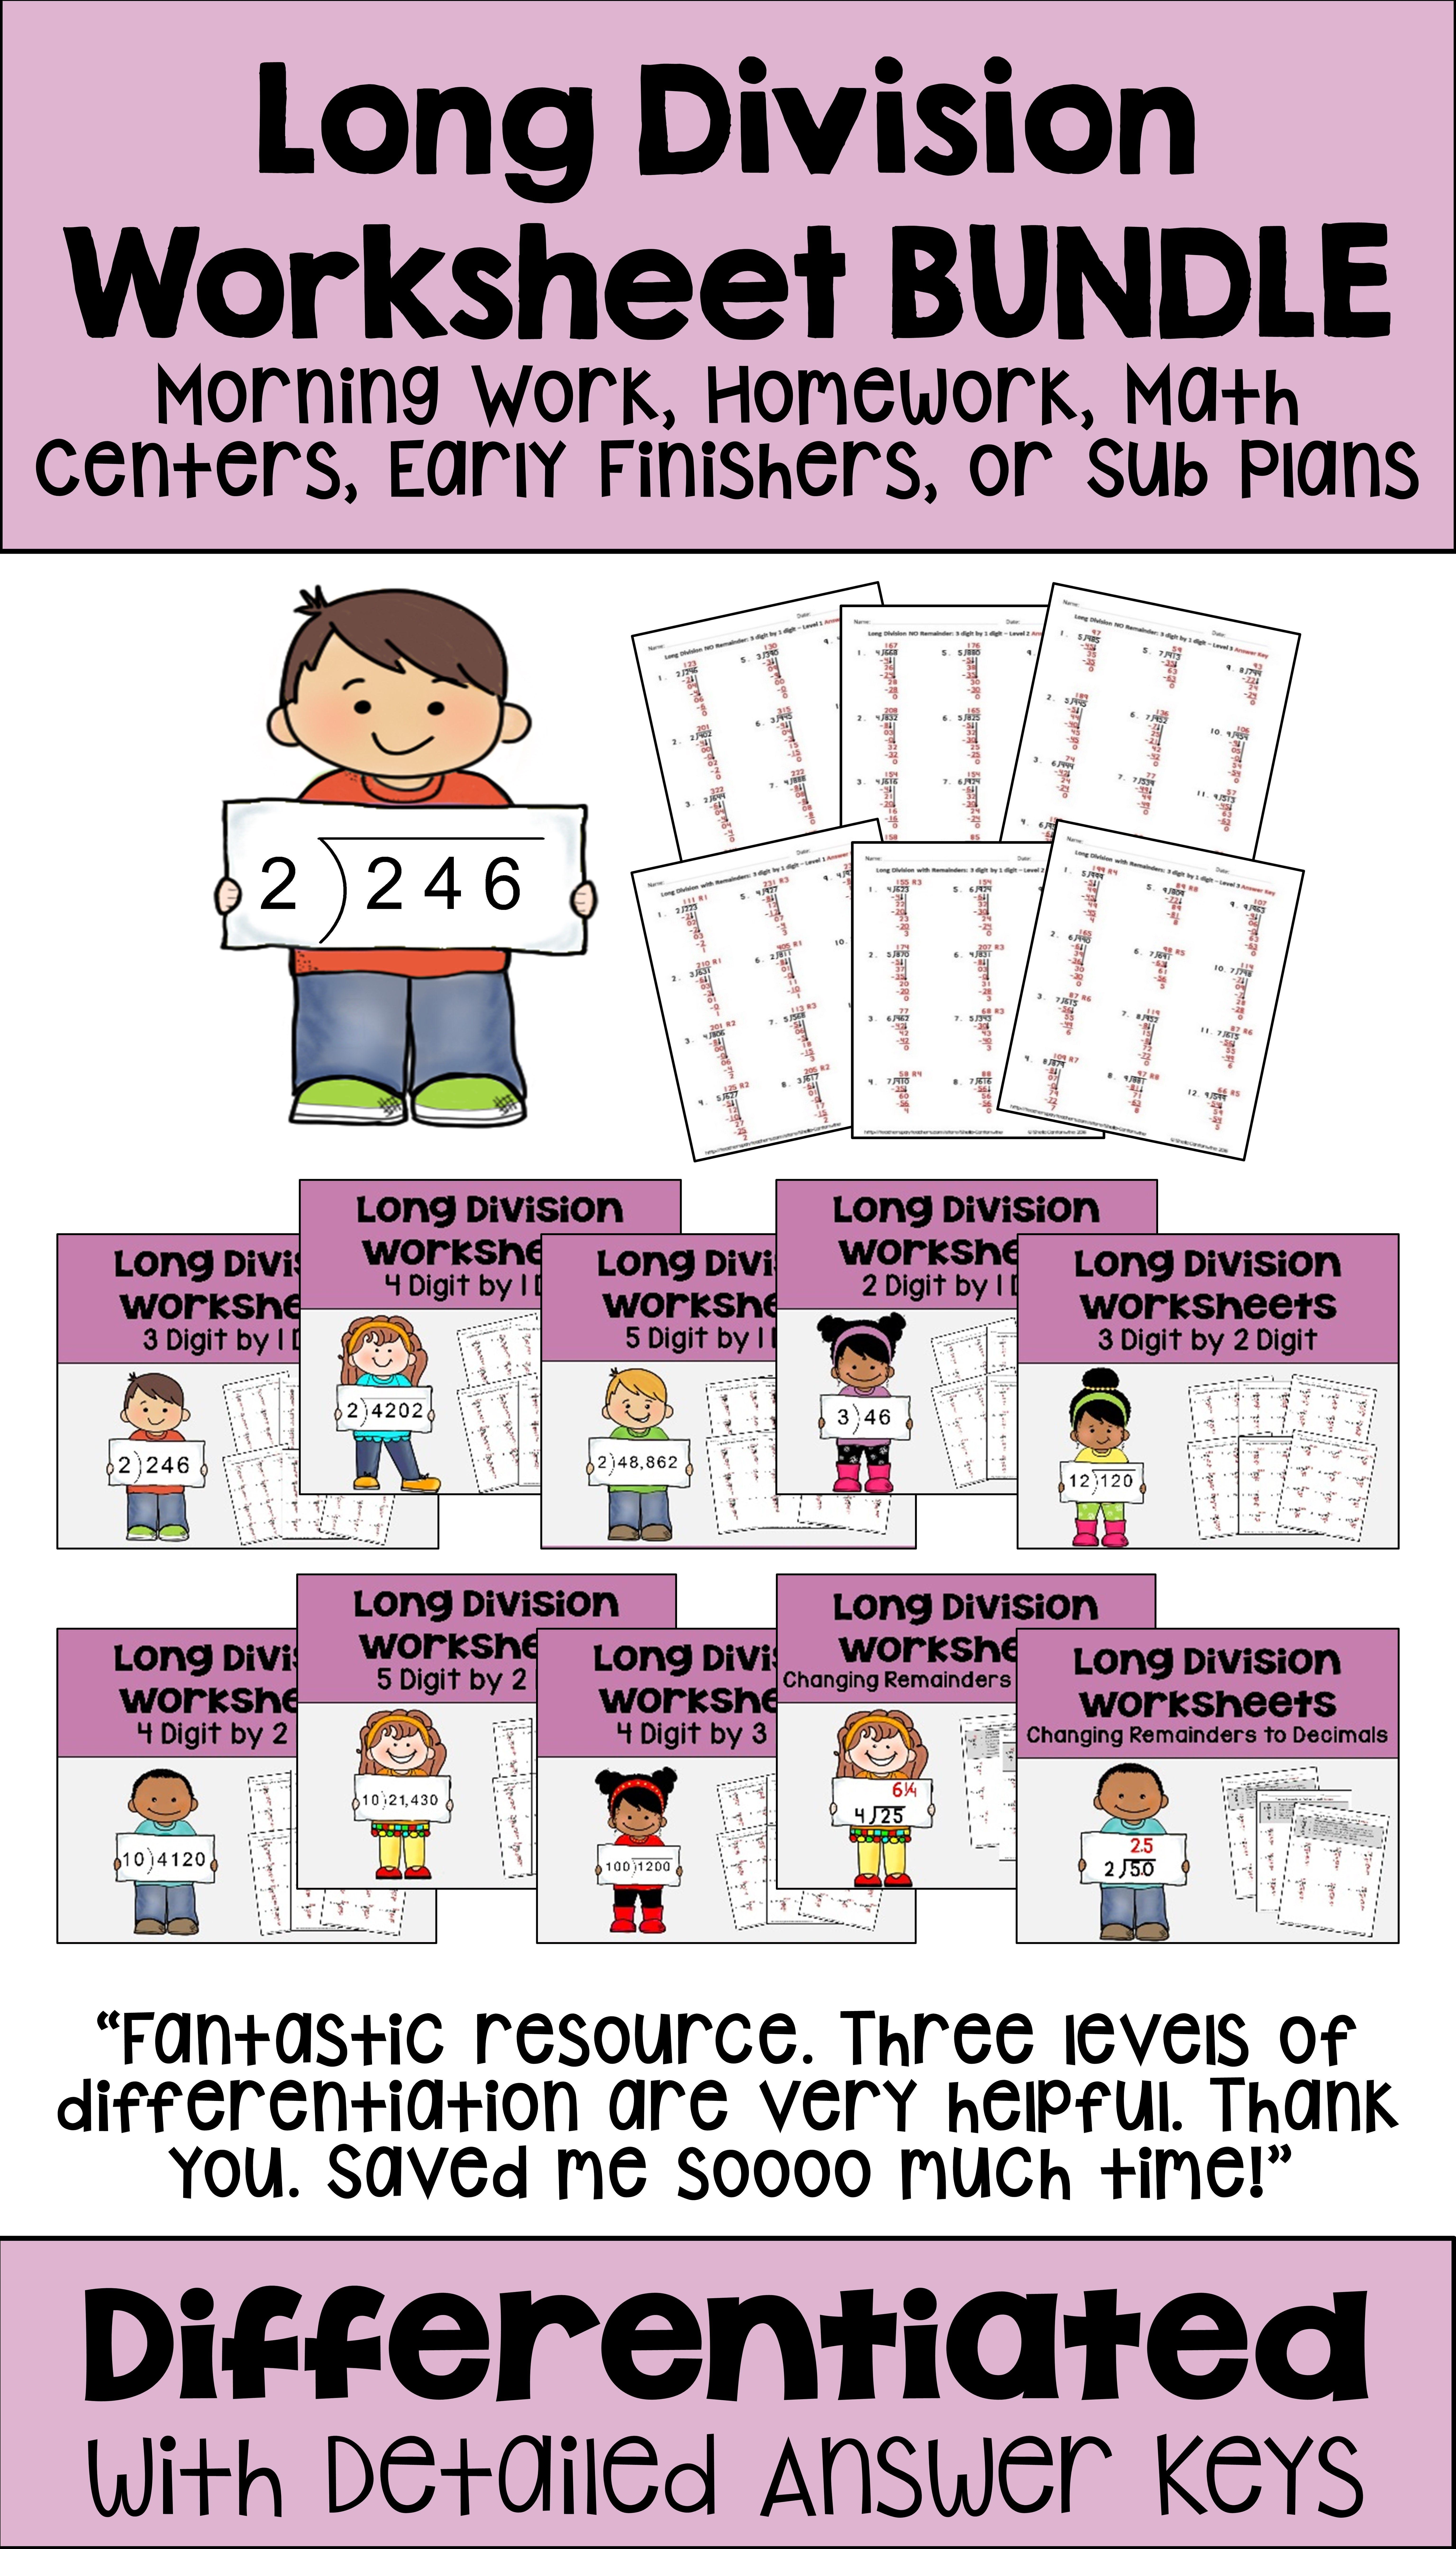 Long Division Worksheet Bundle With Differentiation Long Division Worksheets Division Worksheets Long Division [ 10752 x 6144 Pixel ]